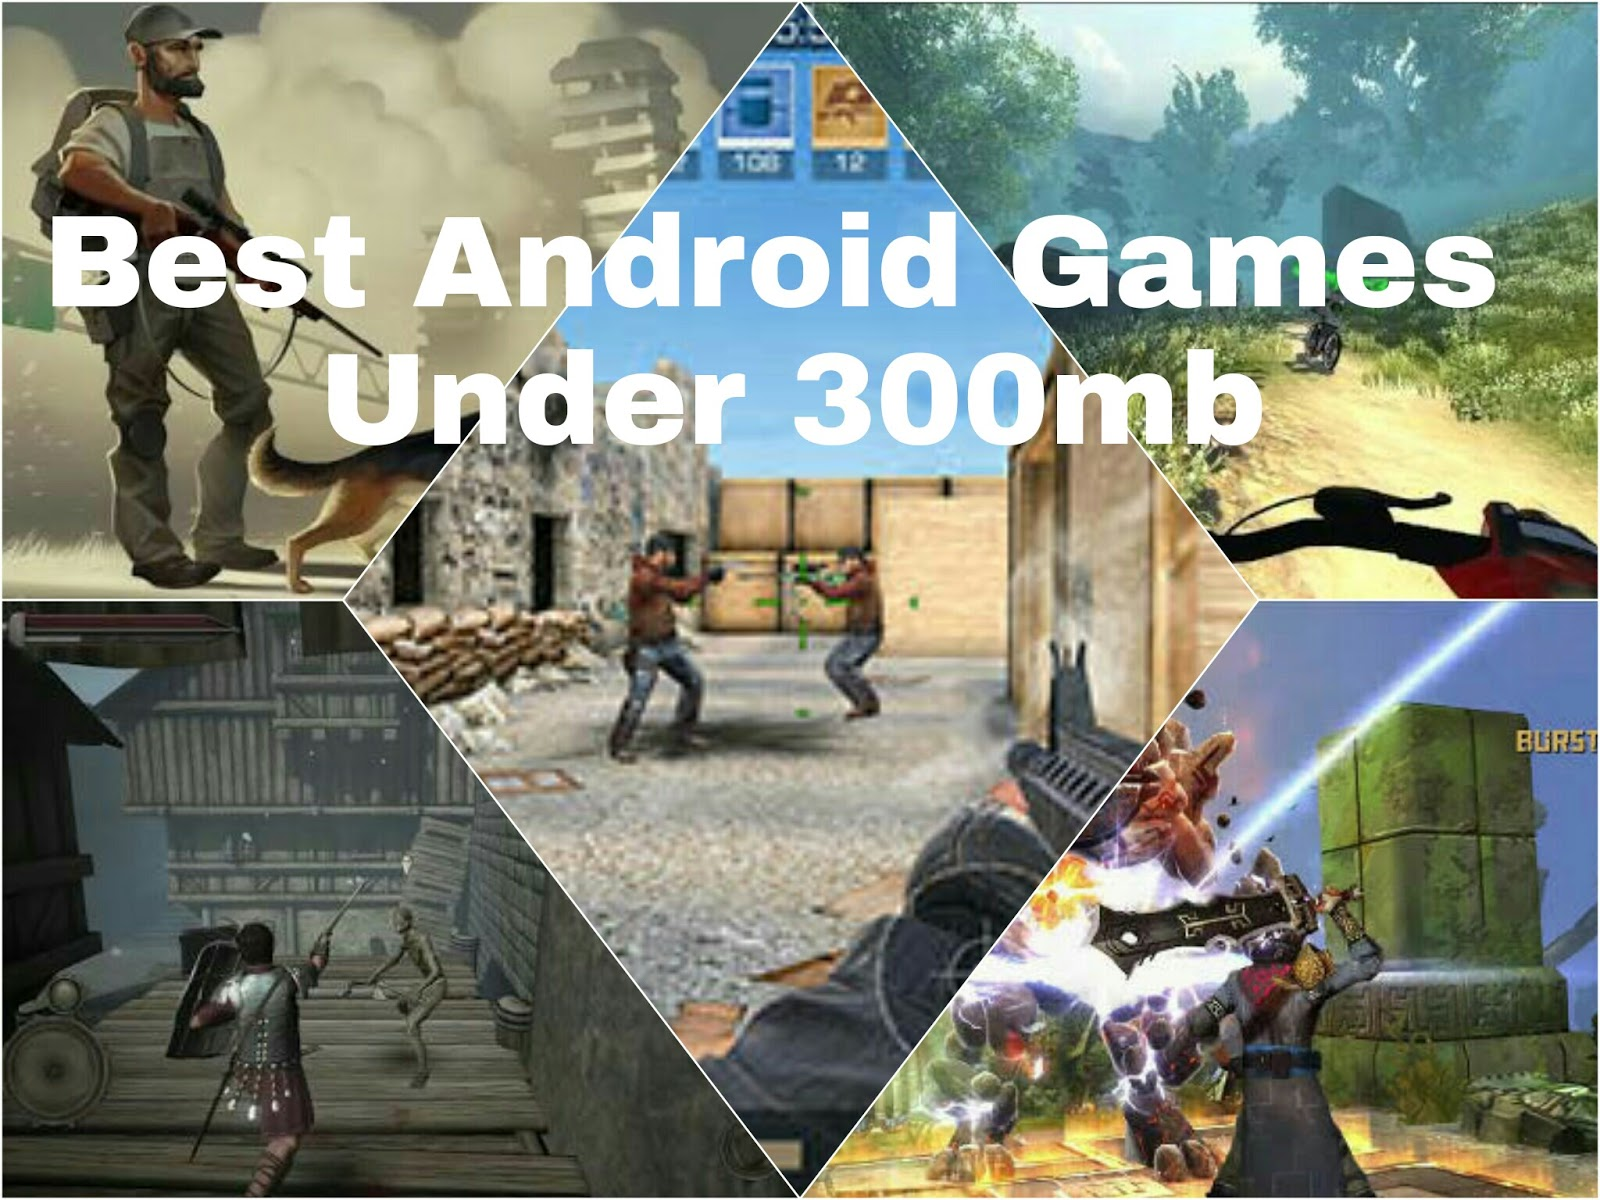 Top 5 Games under 300mb